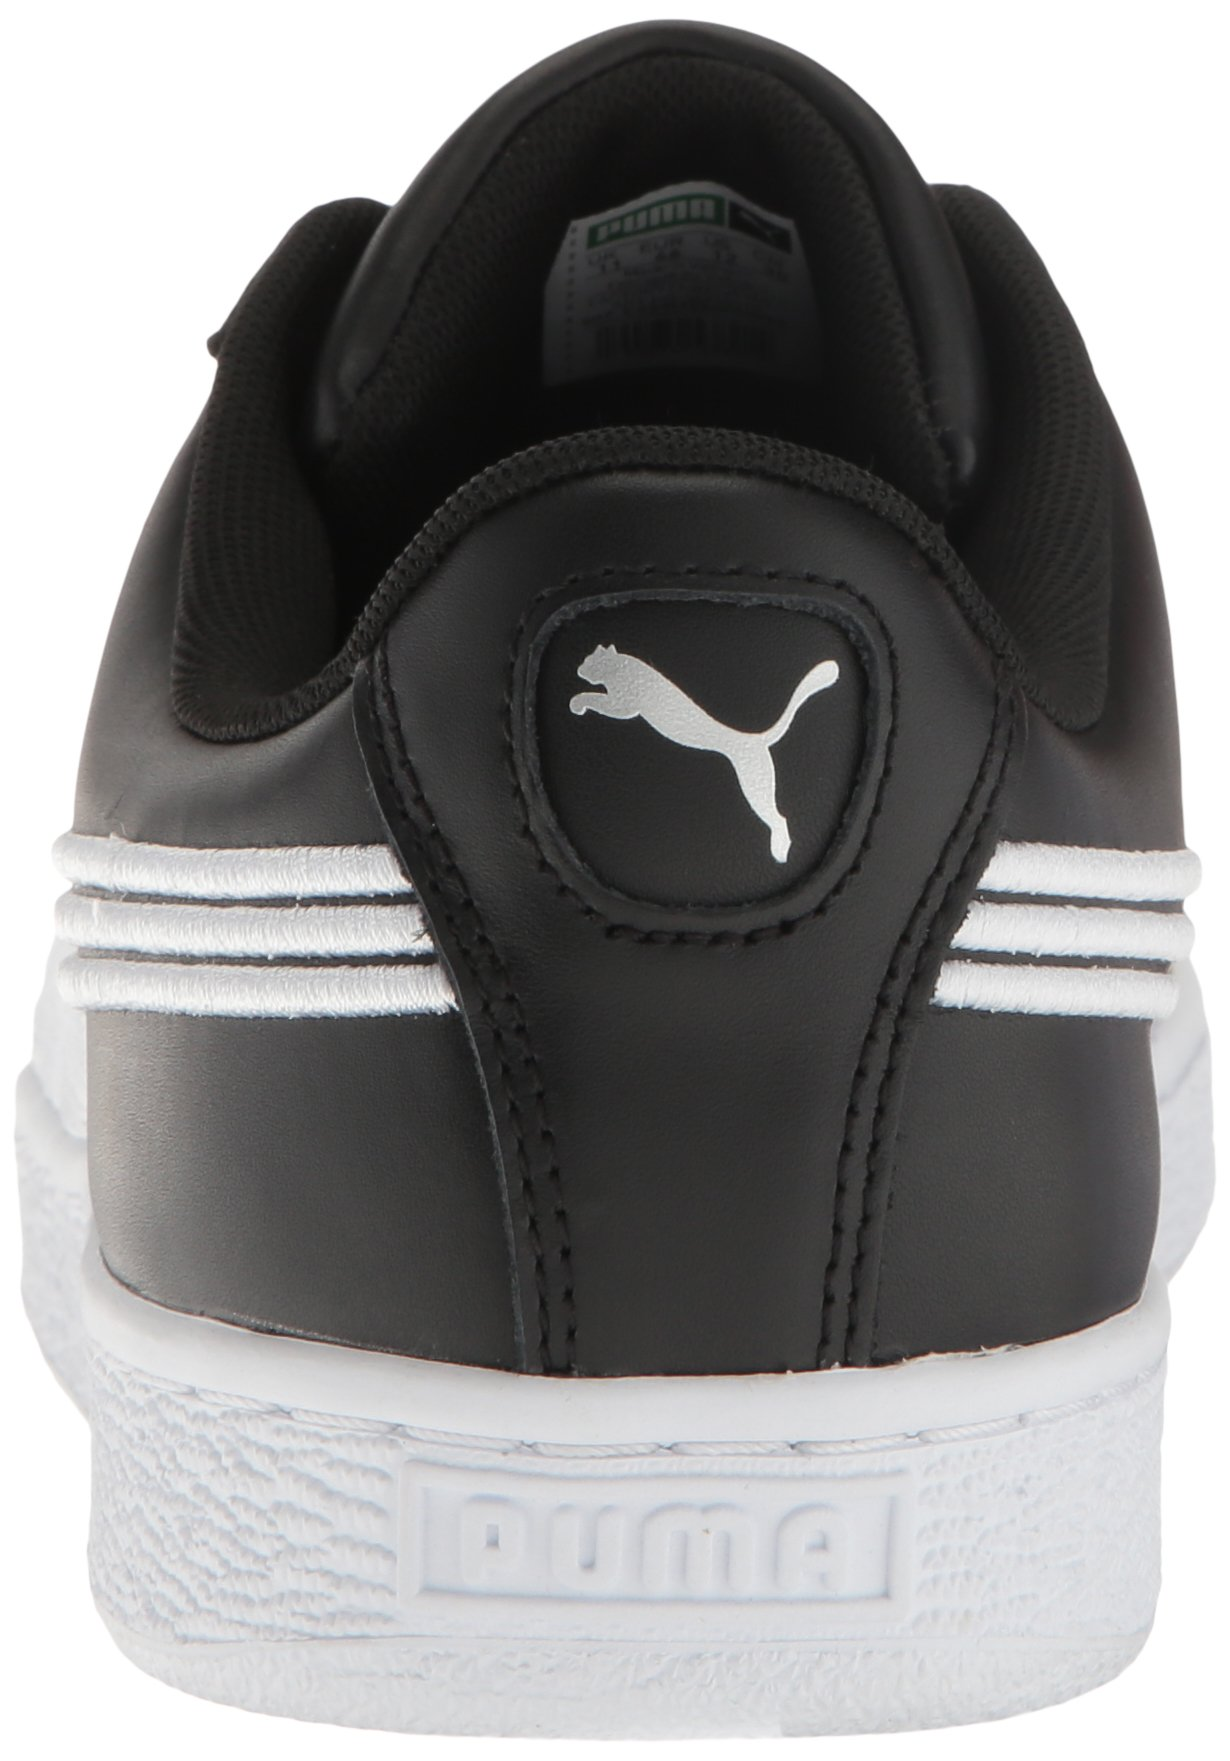 PUMA Men's Basket Classic Badge Fashion Sneaker